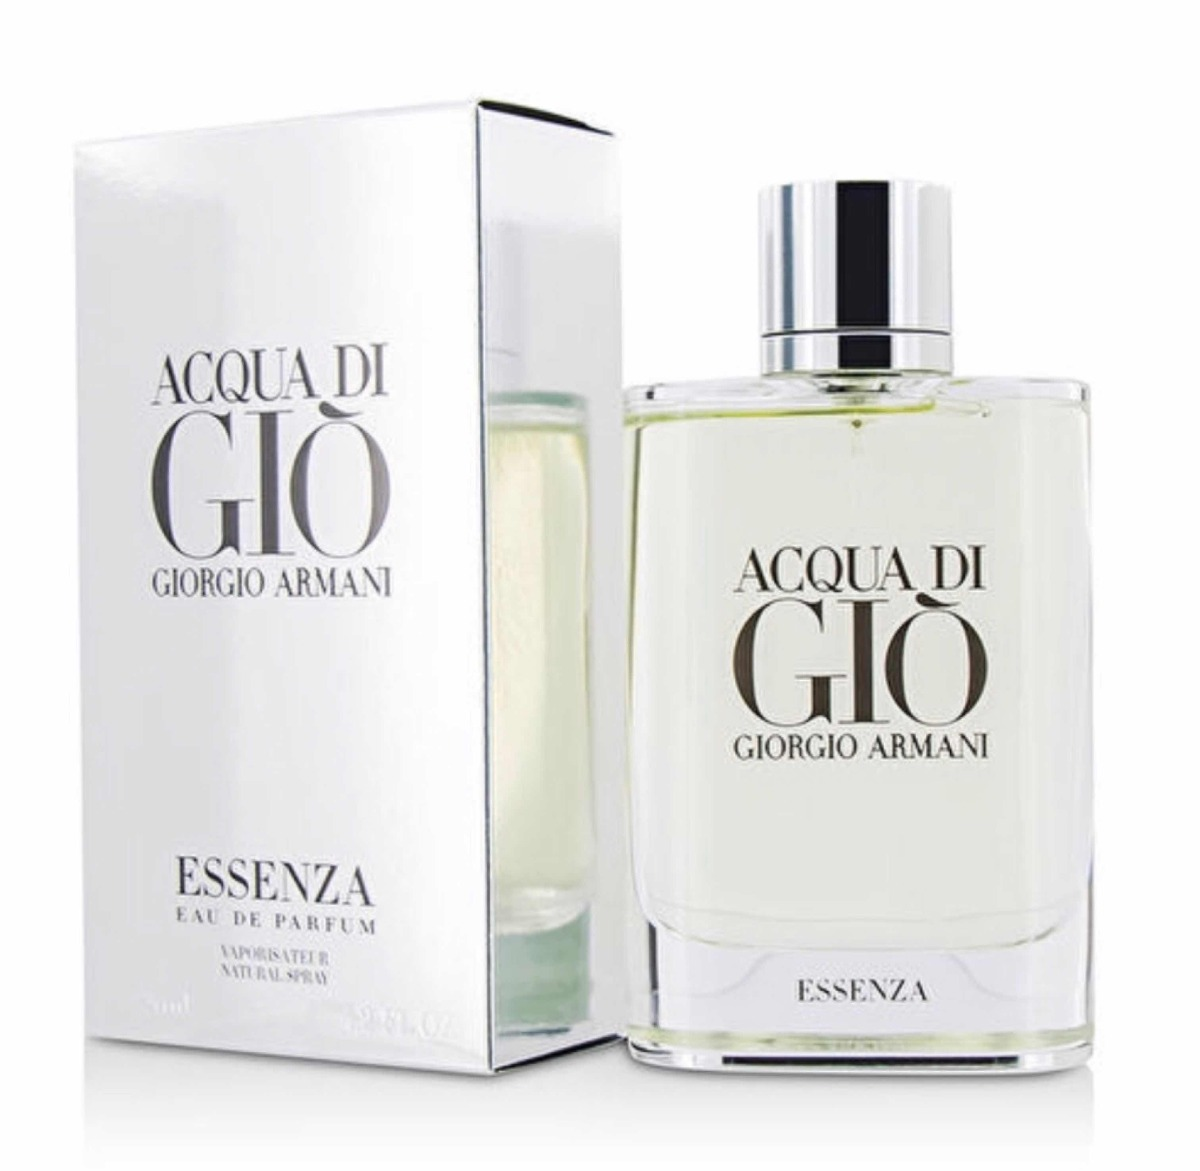 00f301bde1cd7 Características. Marca Giorgio Armani  Nombre del perfume Acqua di Gio  Essenza  Versión Essenza  Género Hombre  Tipo Eau de parfum ...